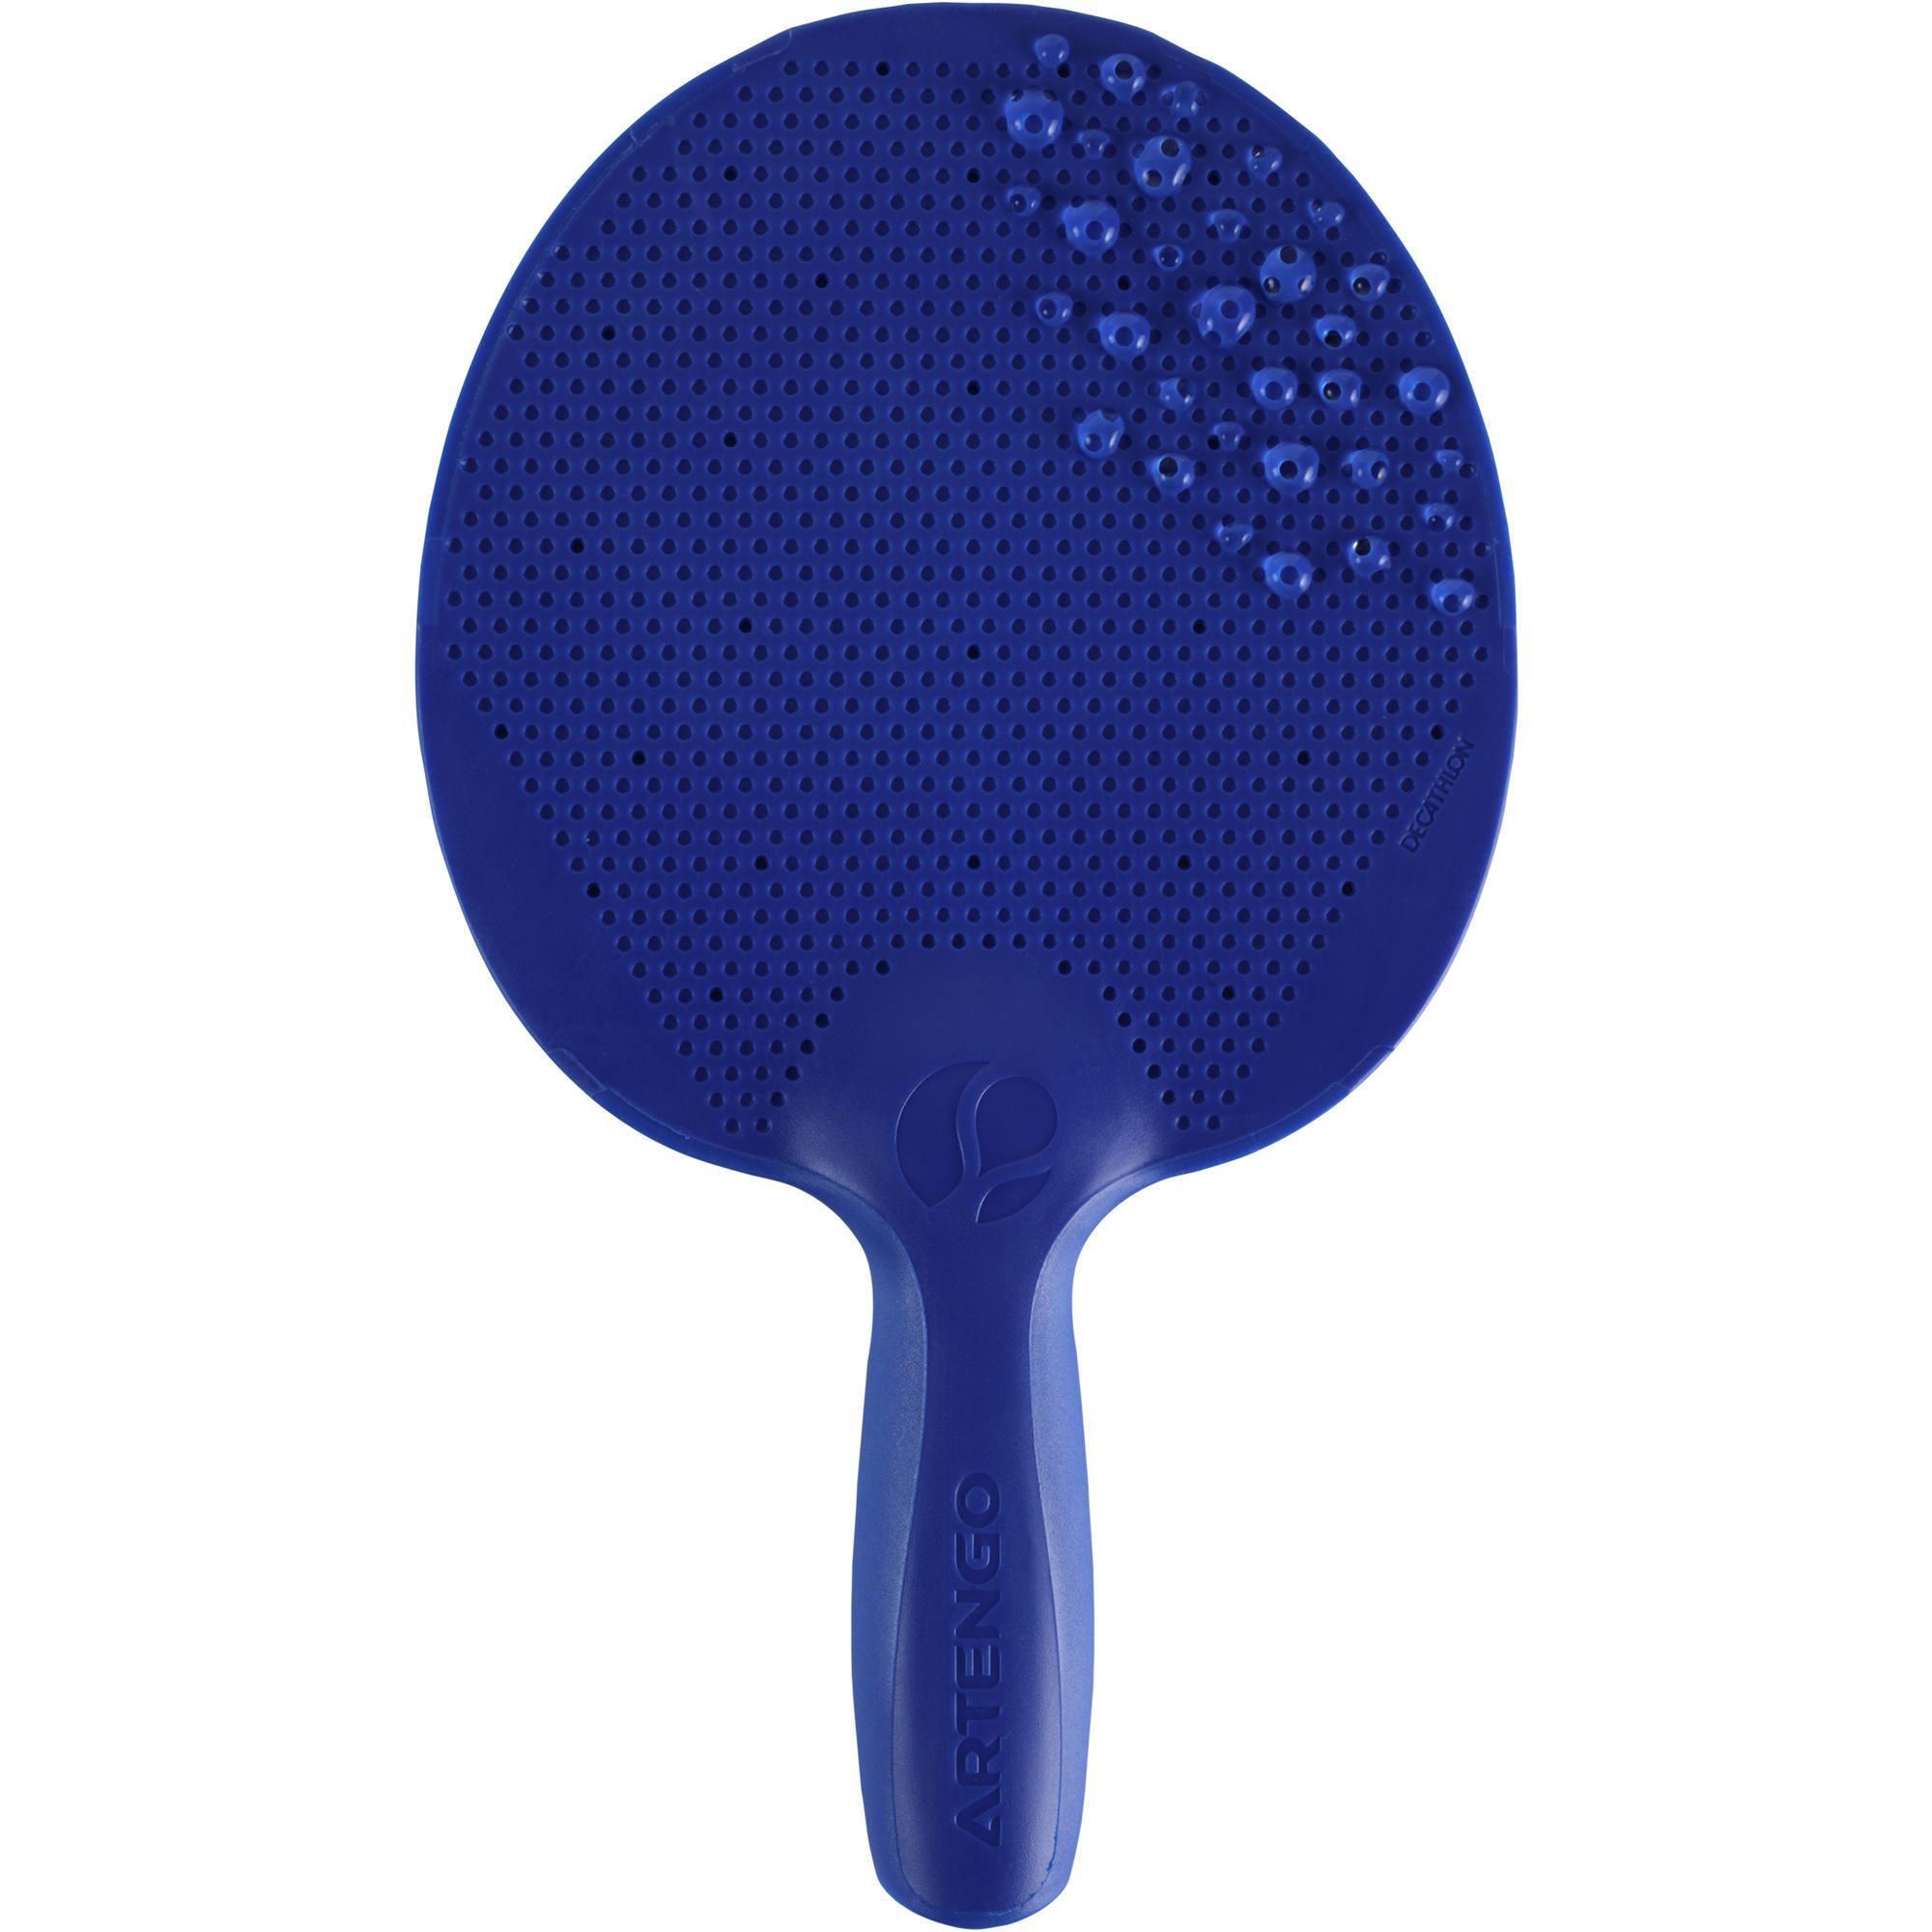 raquette de free ping pong fr 100 o bleue clubs collectivit s decathlon pro. Black Bedroom Furniture Sets. Home Design Ideas